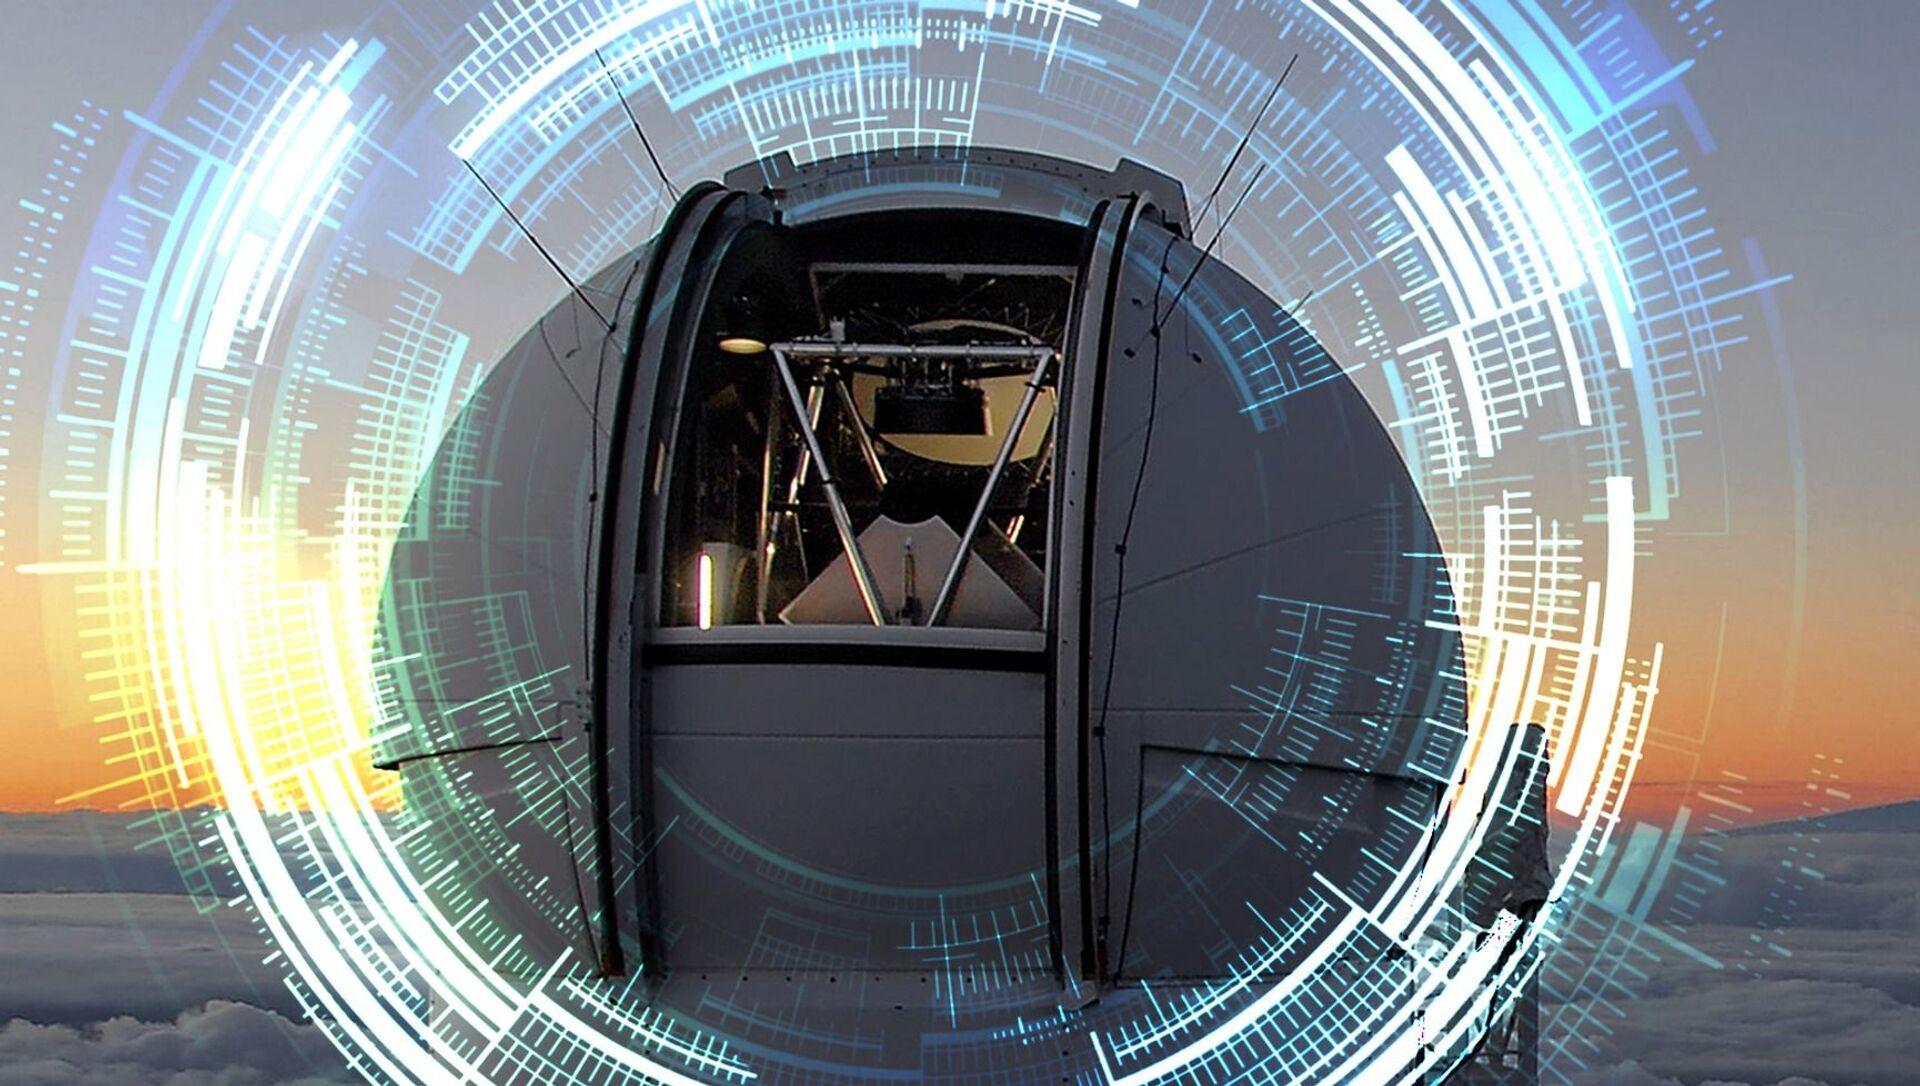 Observatorio astrónomico - Sputnik Mundo, 1920, 01.09.2020